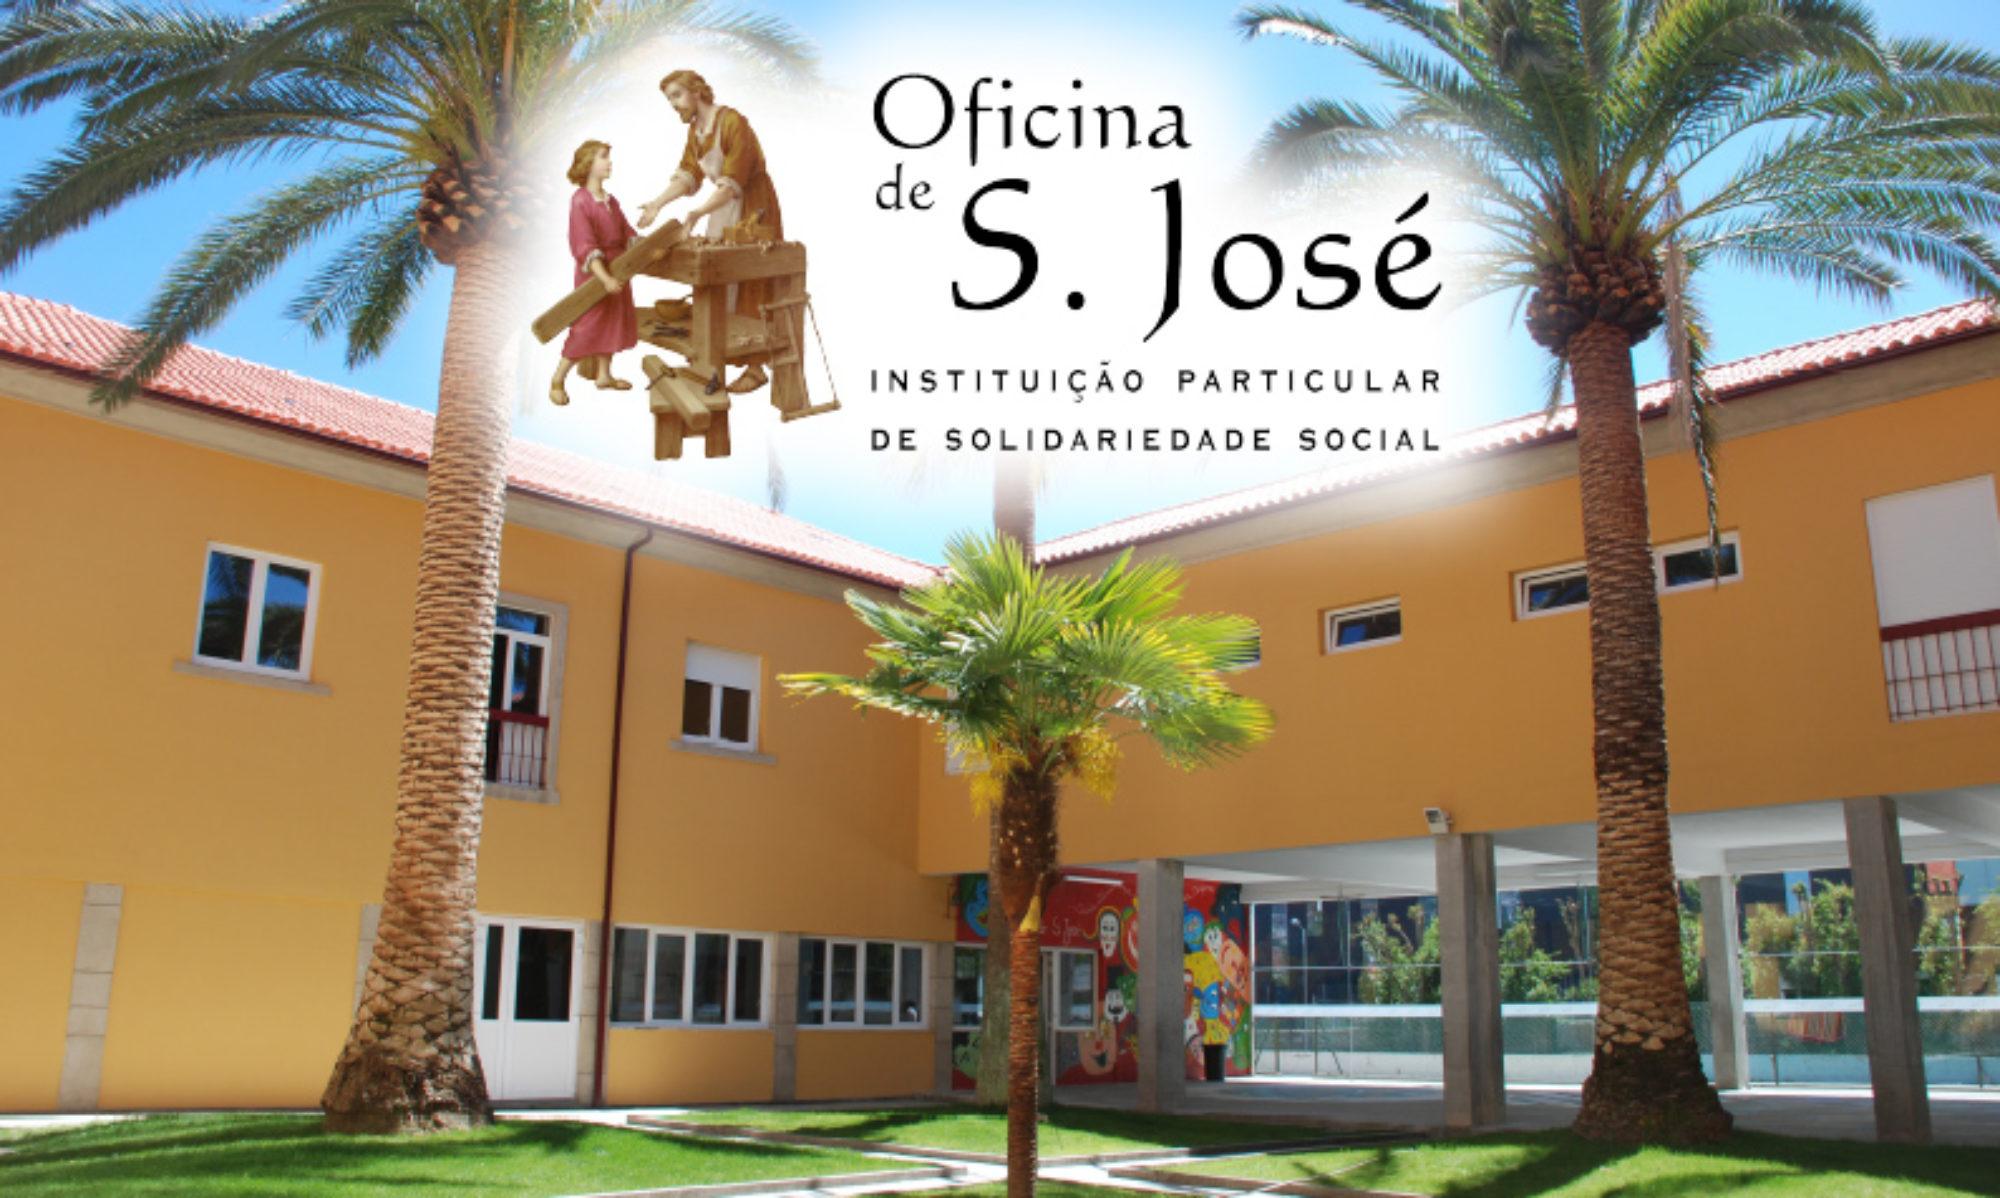 Oficina de S. José - IPSS